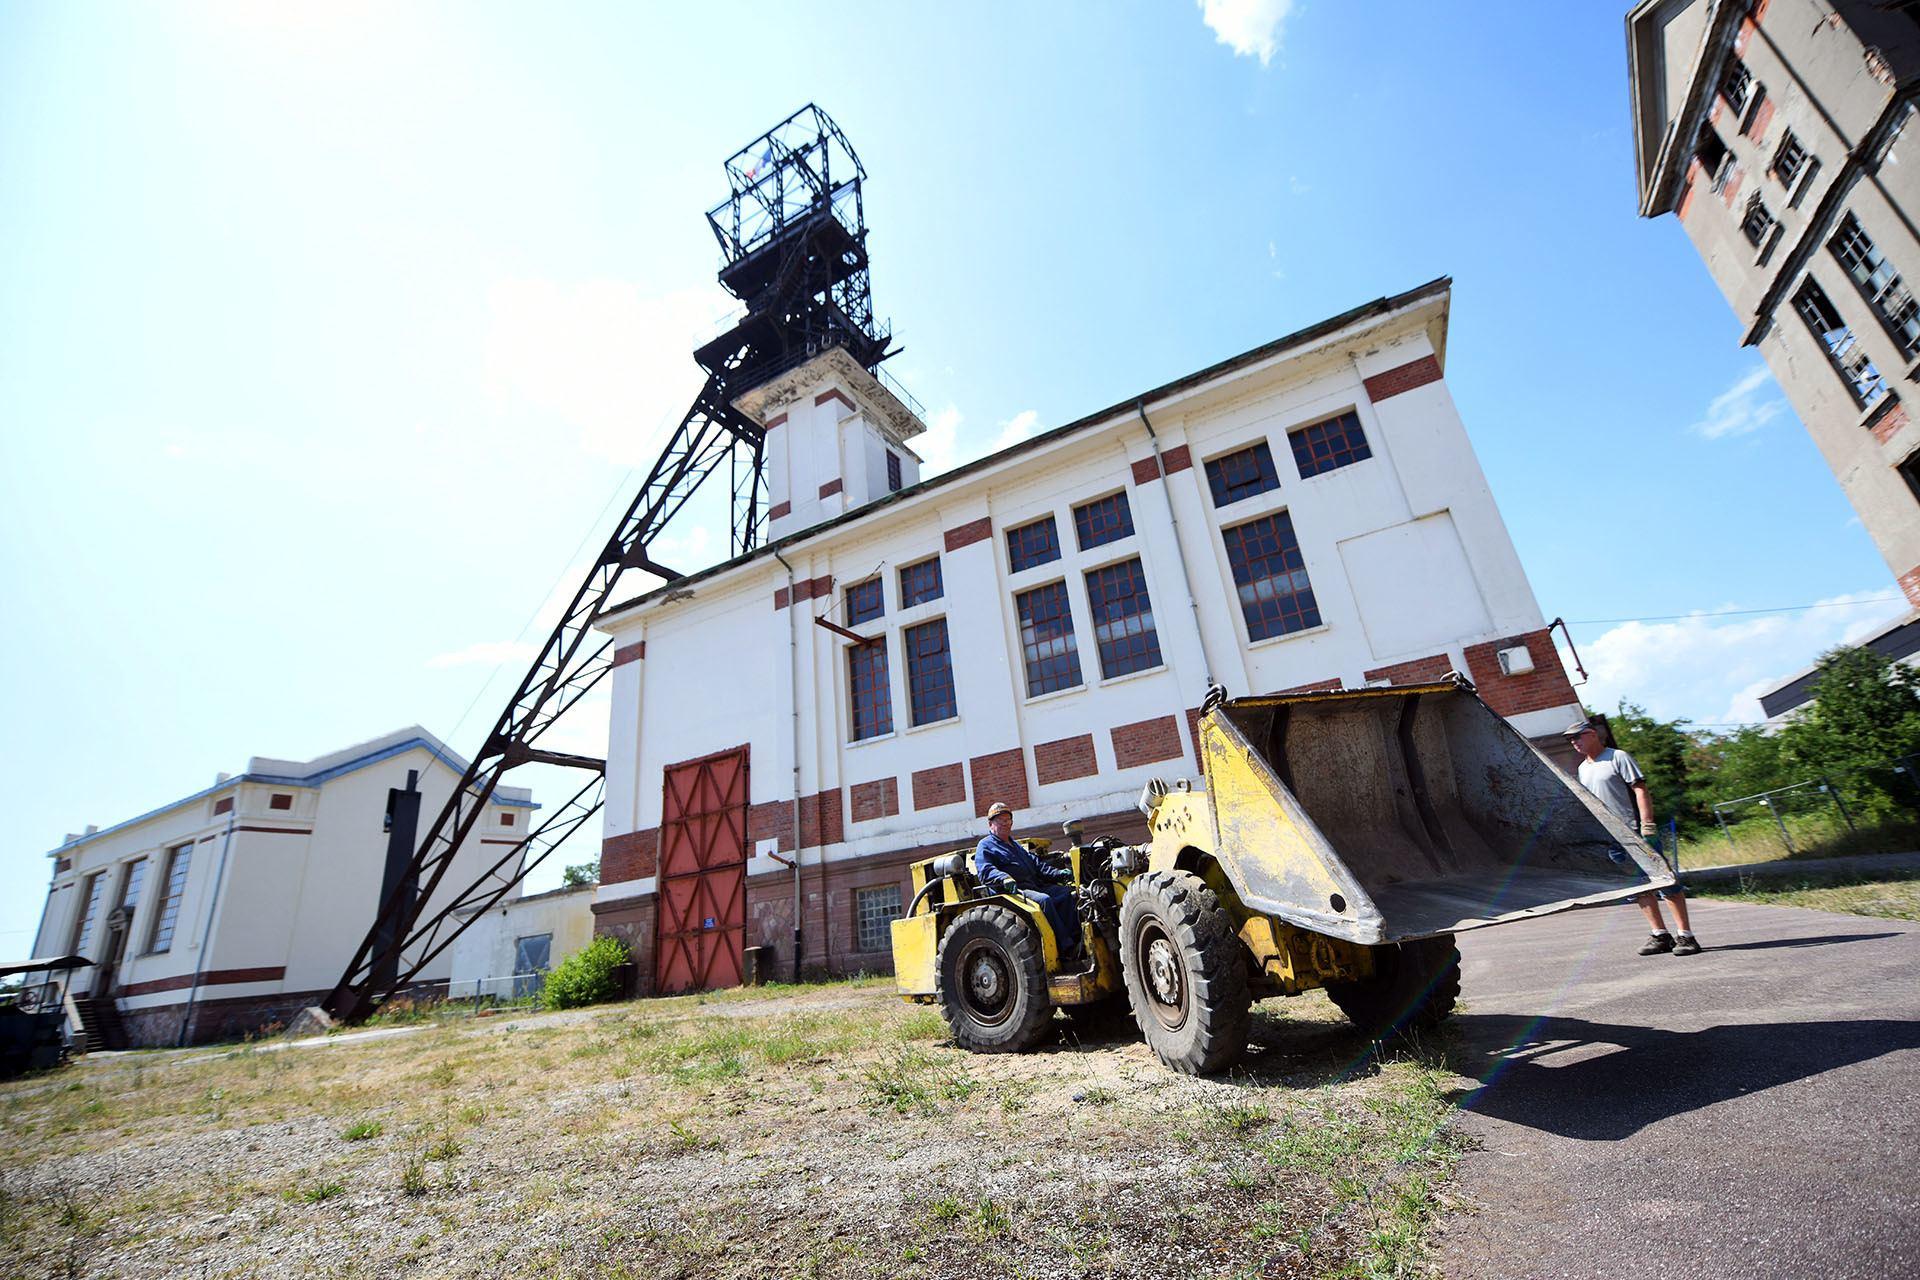 mine-potass-carreau-rodolphe-puits-extraction